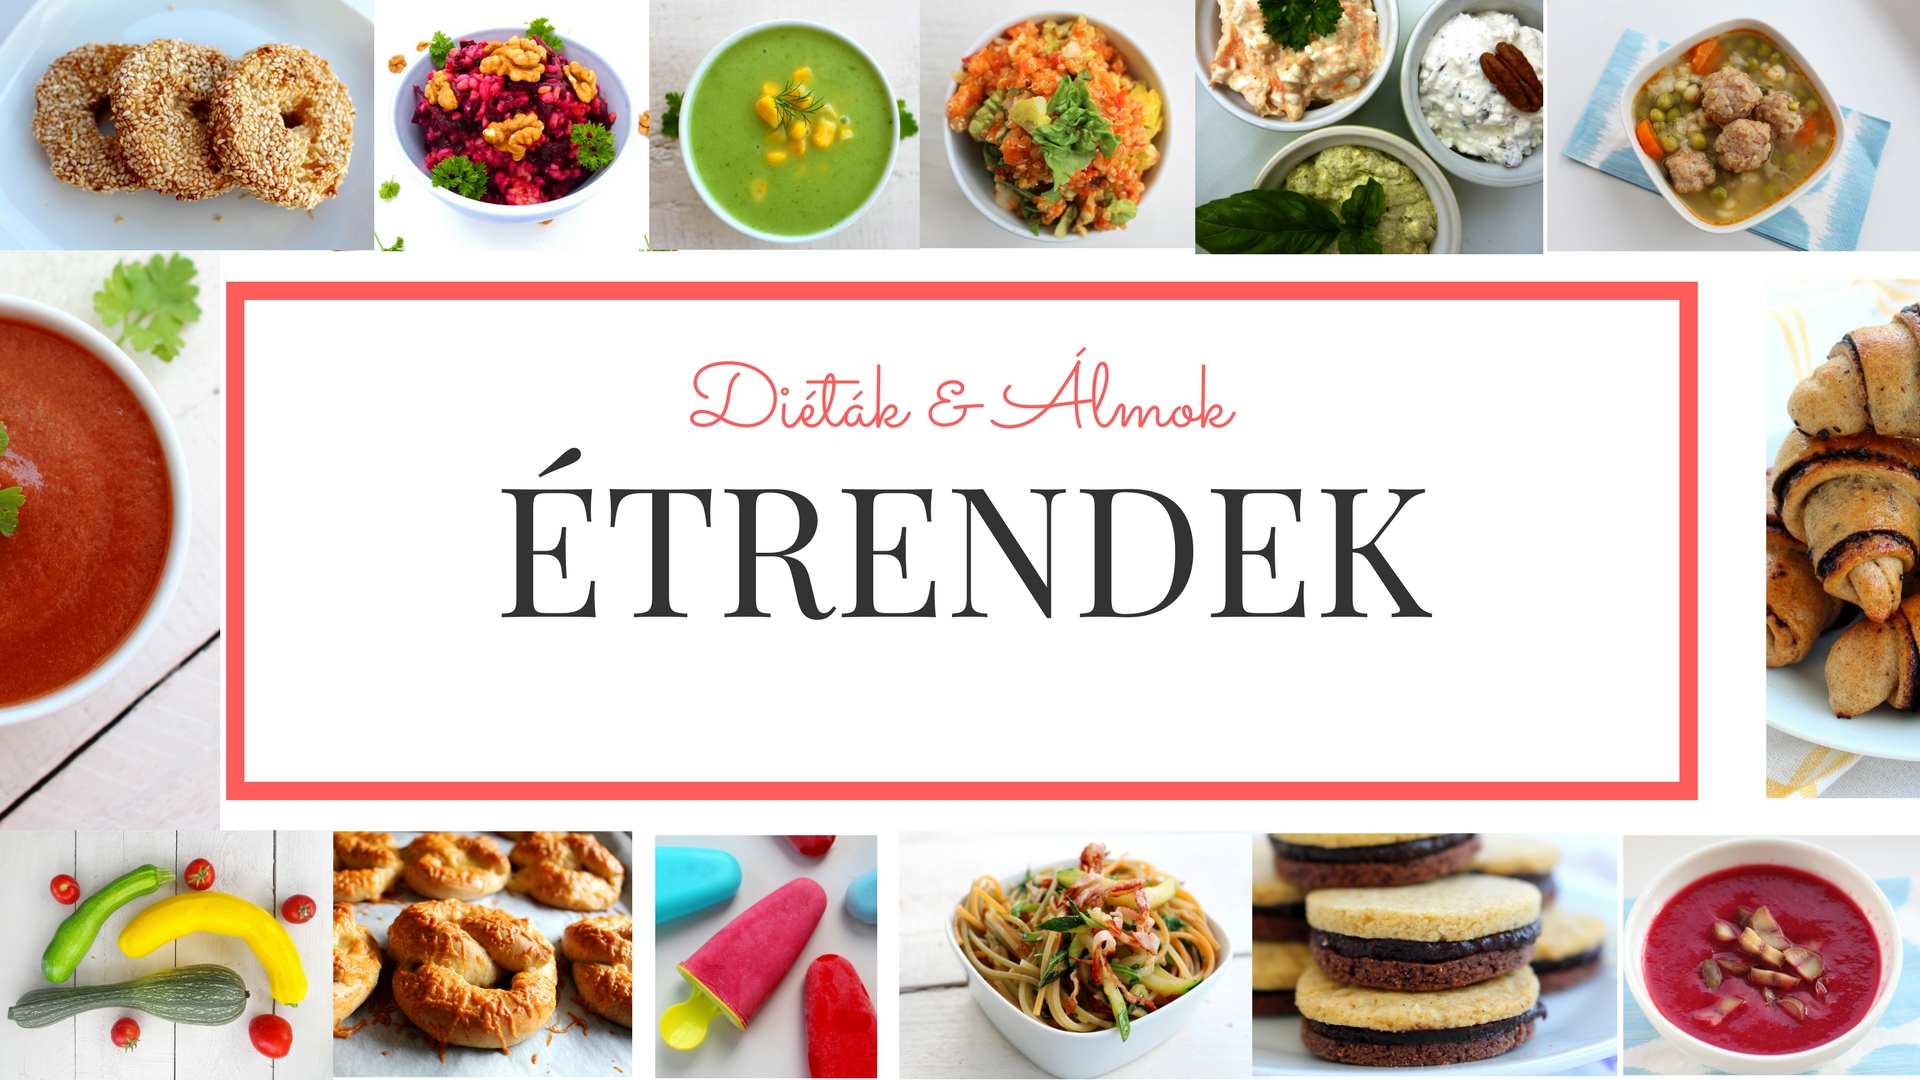 dietak_almok_szenhidrat_dieta_etrend_blog.jpg